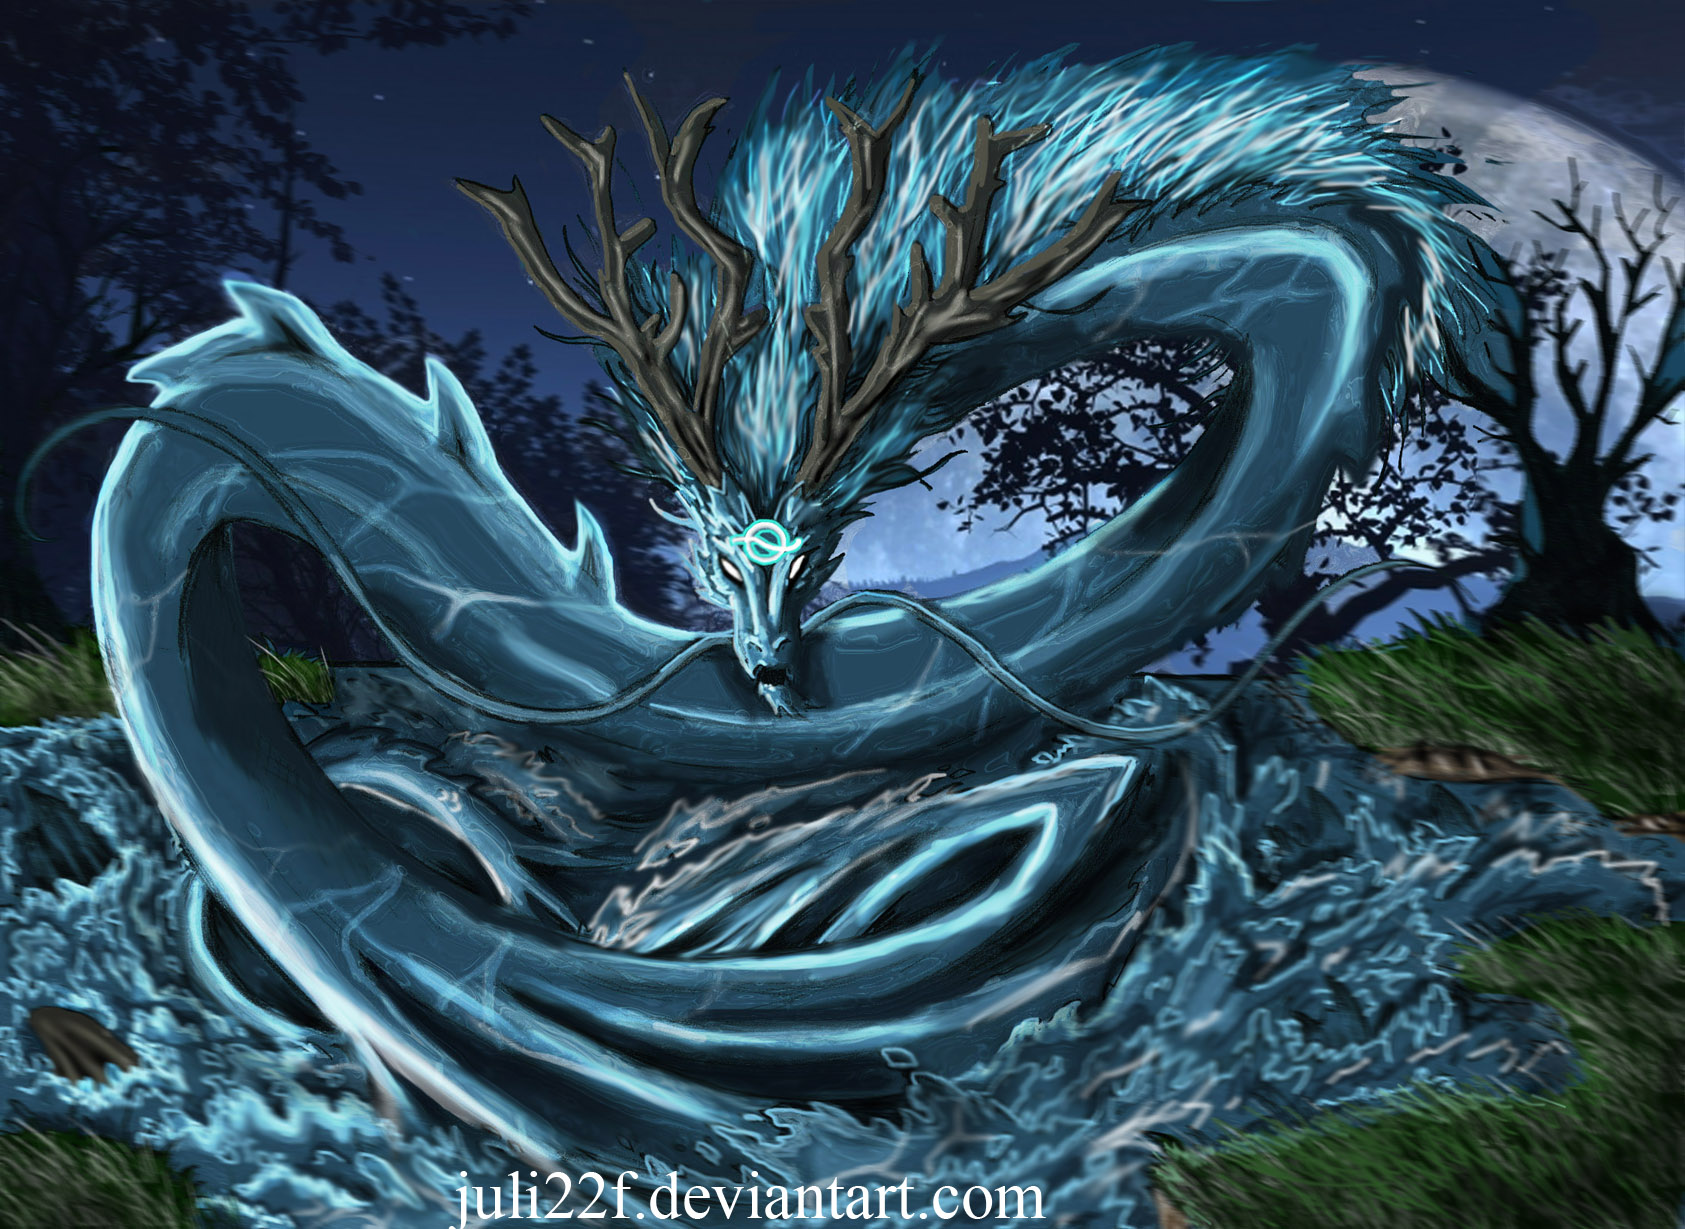 Dhajai Aleyan  Dragon_de_agua_by_juli22f